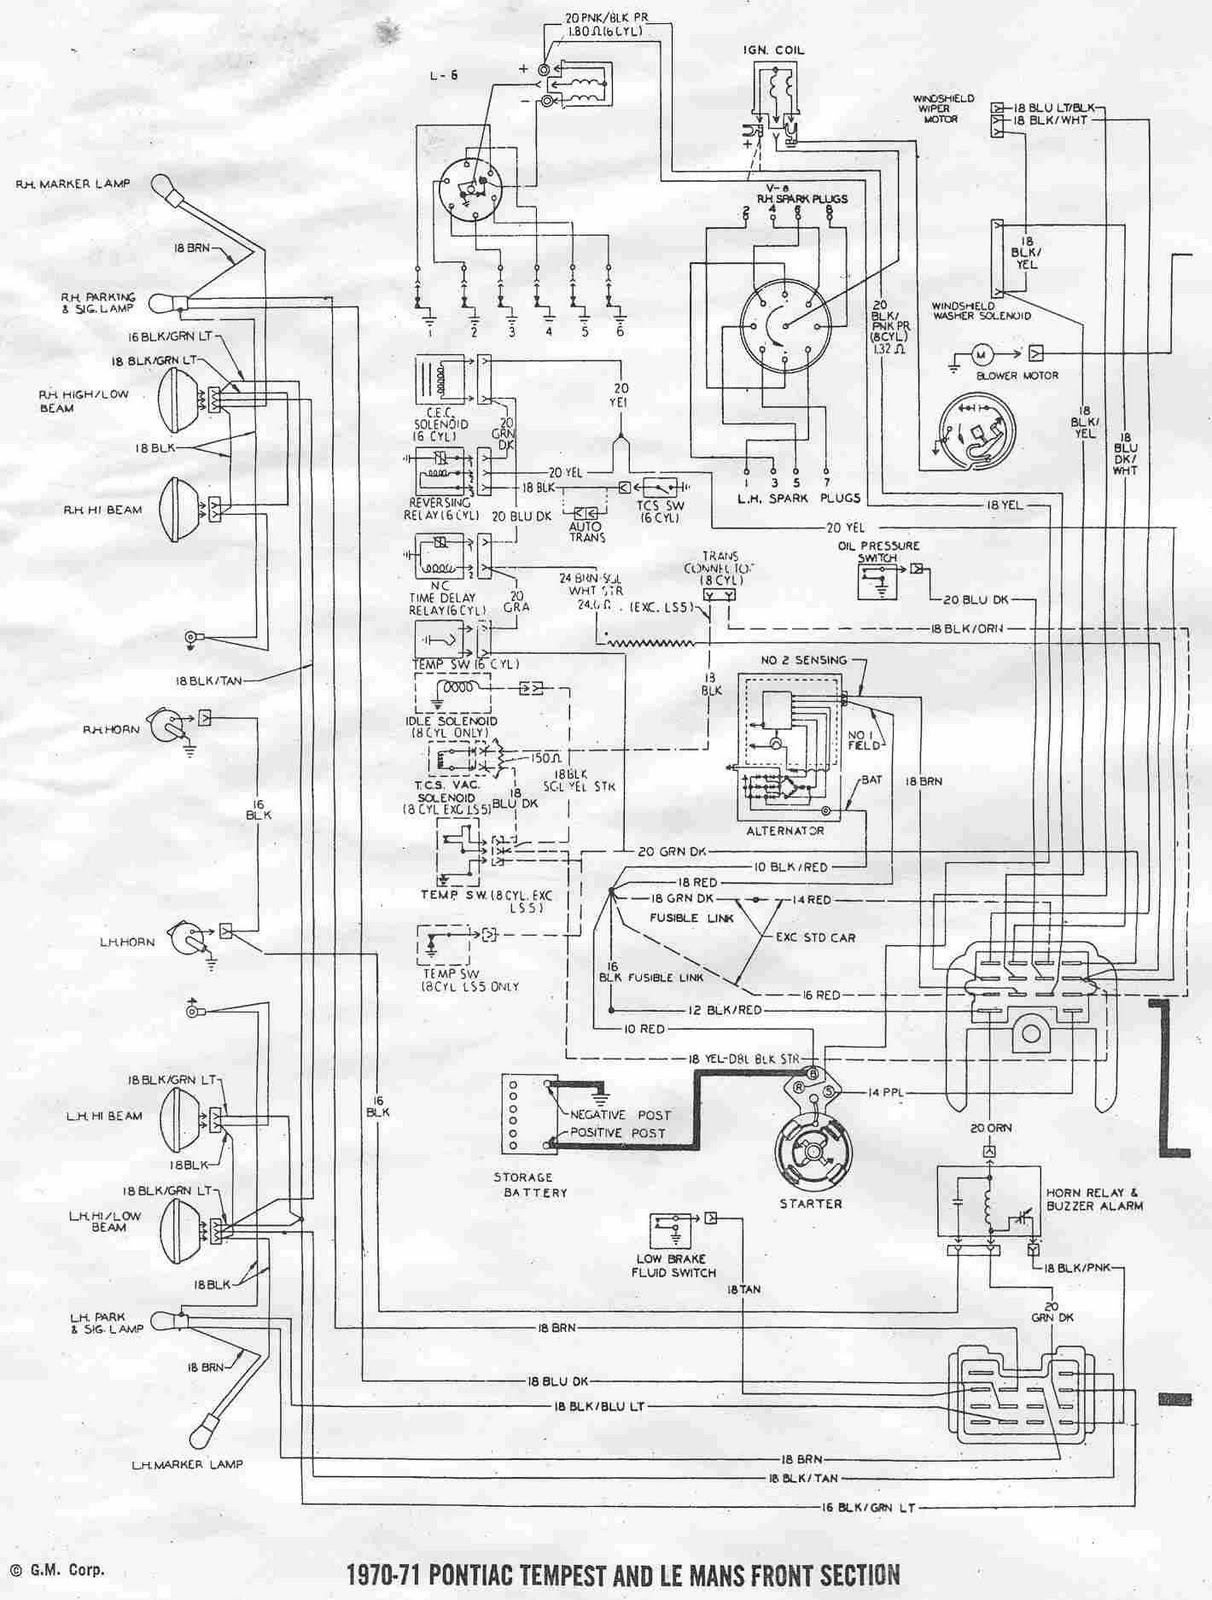 medium resolution of 1967 pontiac lemans wiring diagram wiring diagrams rh 34 jennifer retzke de 1964 pontiac gto wiring